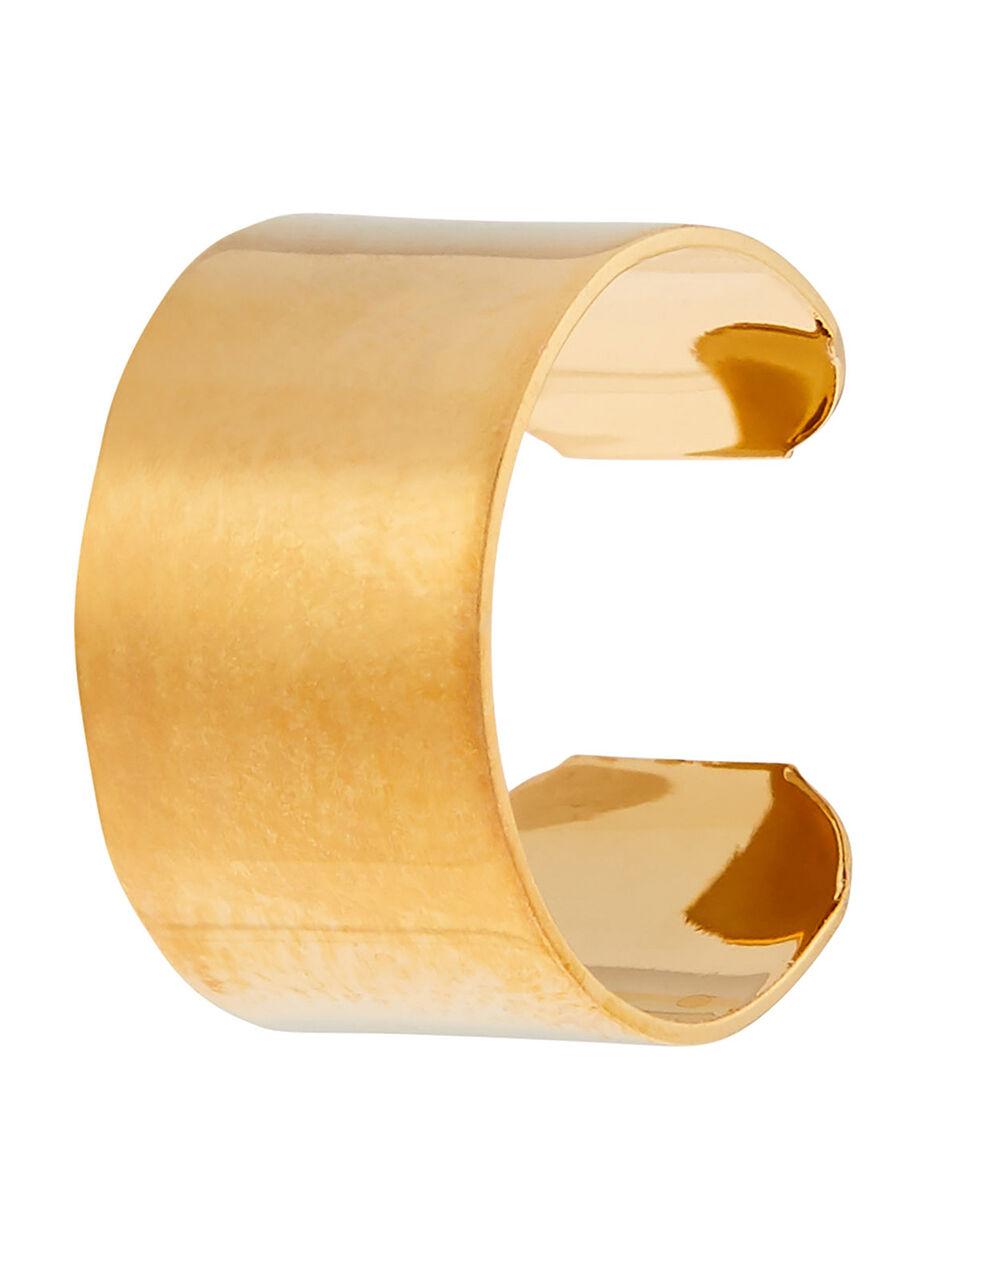 Gold-Plated Plain Ear Cuff, , large